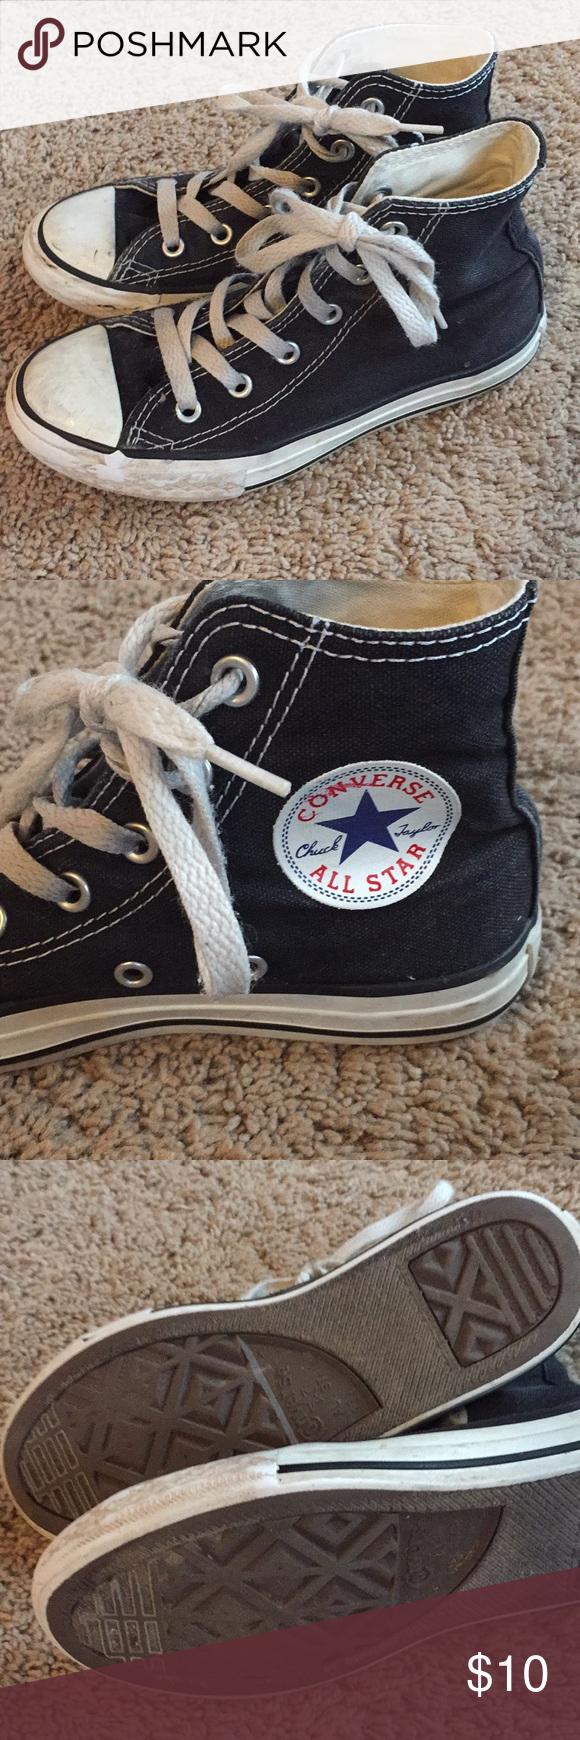 13 converse all-star high tops